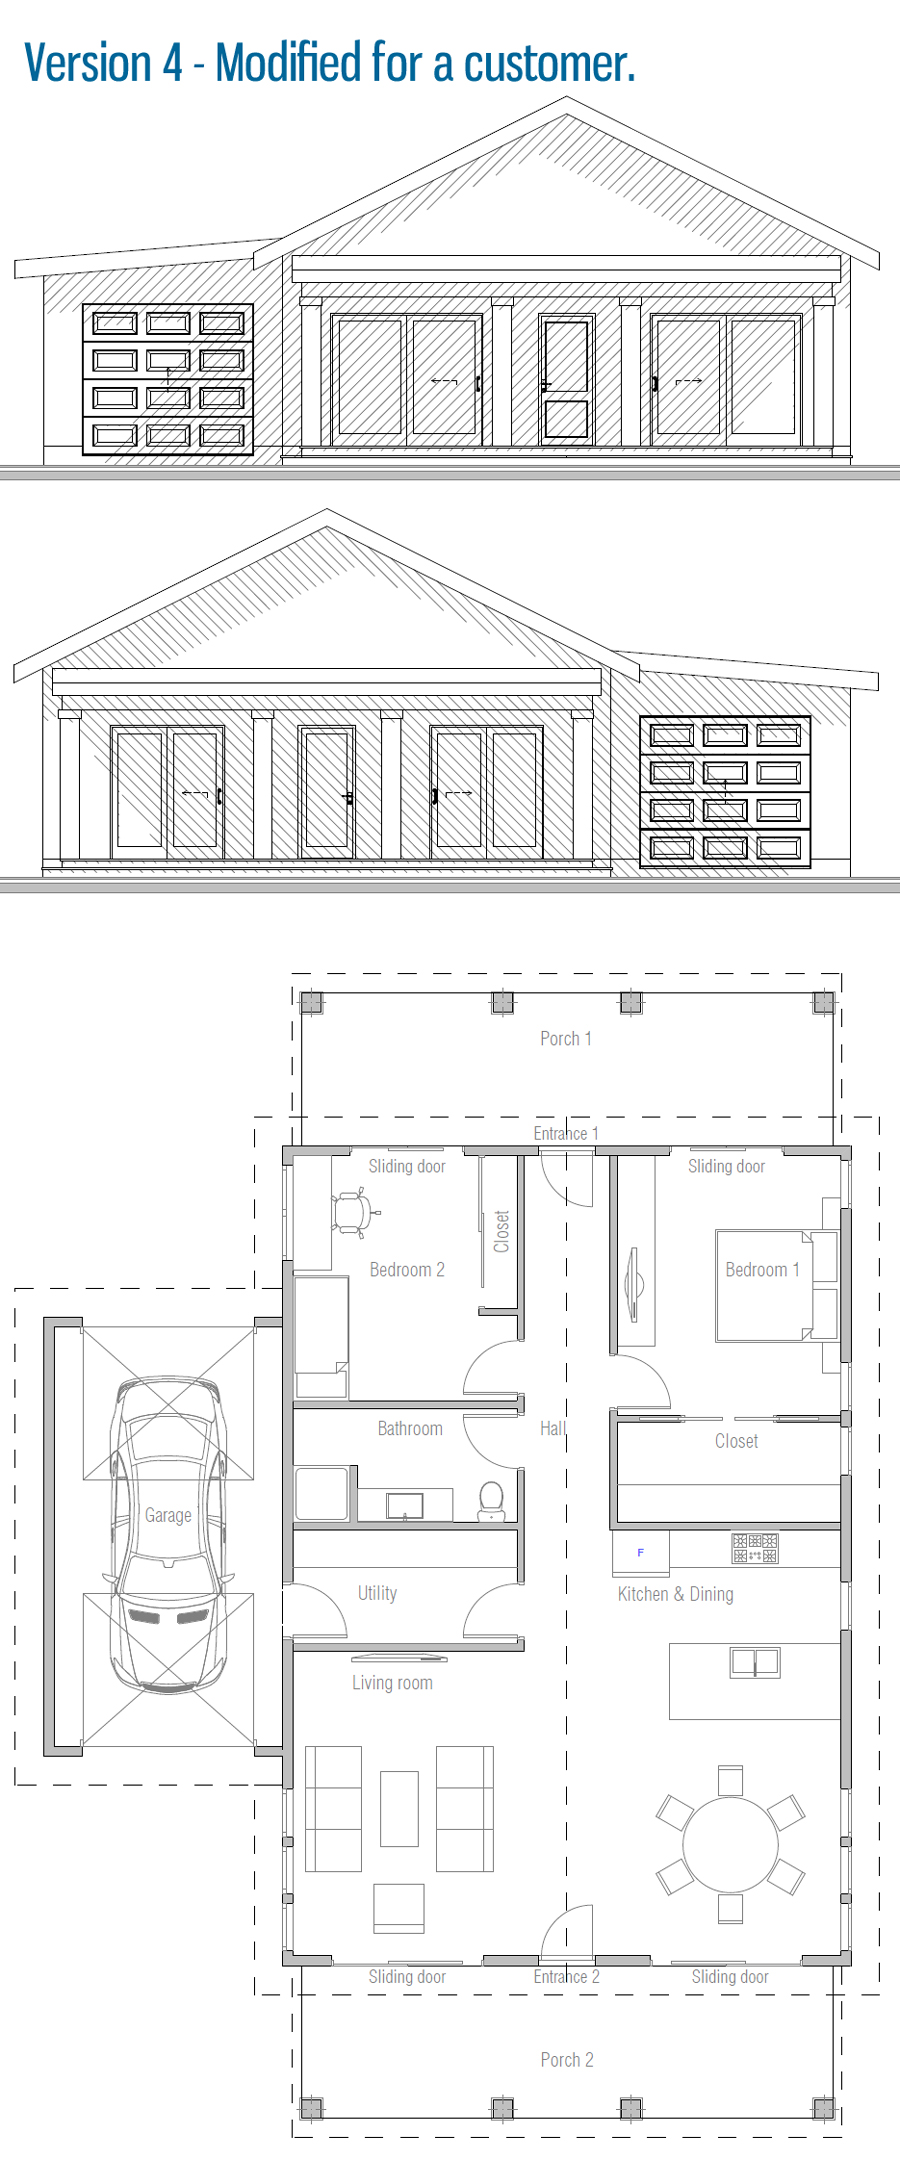 house-plans-2021_40_HOUSE_PLAN_CH673_V4.jpg